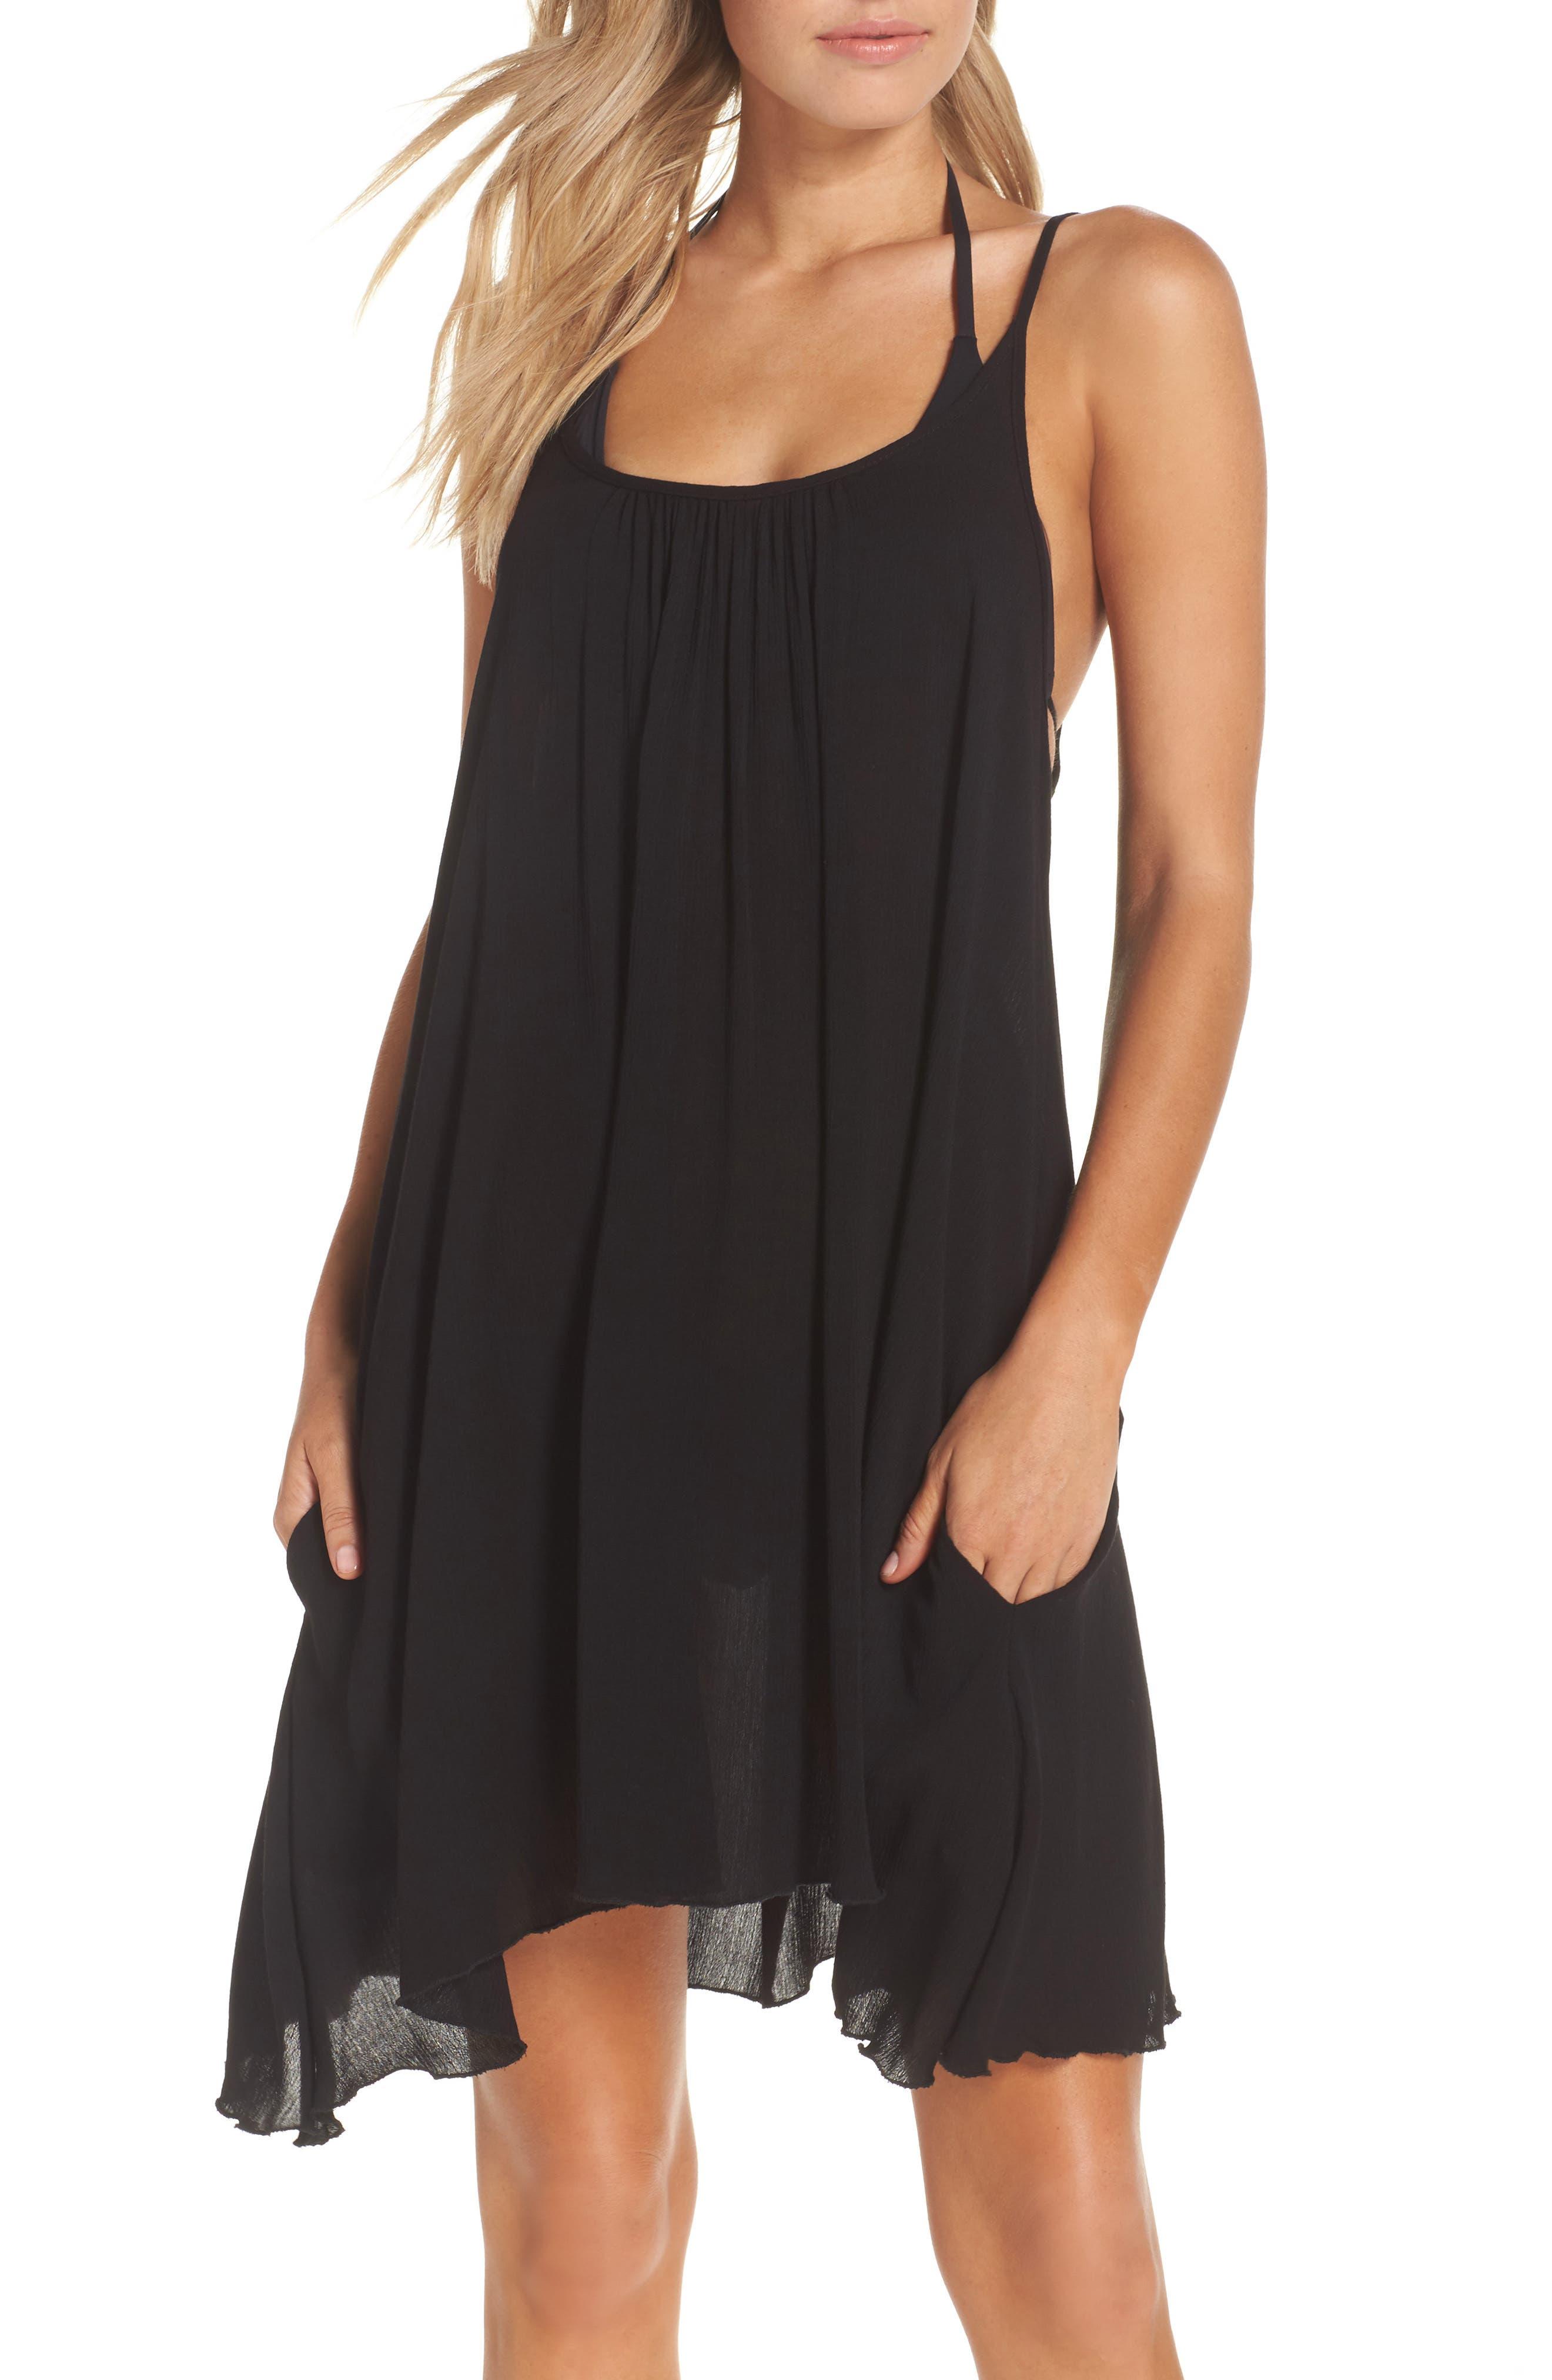 Elan Cover-Up Slipdress, Black